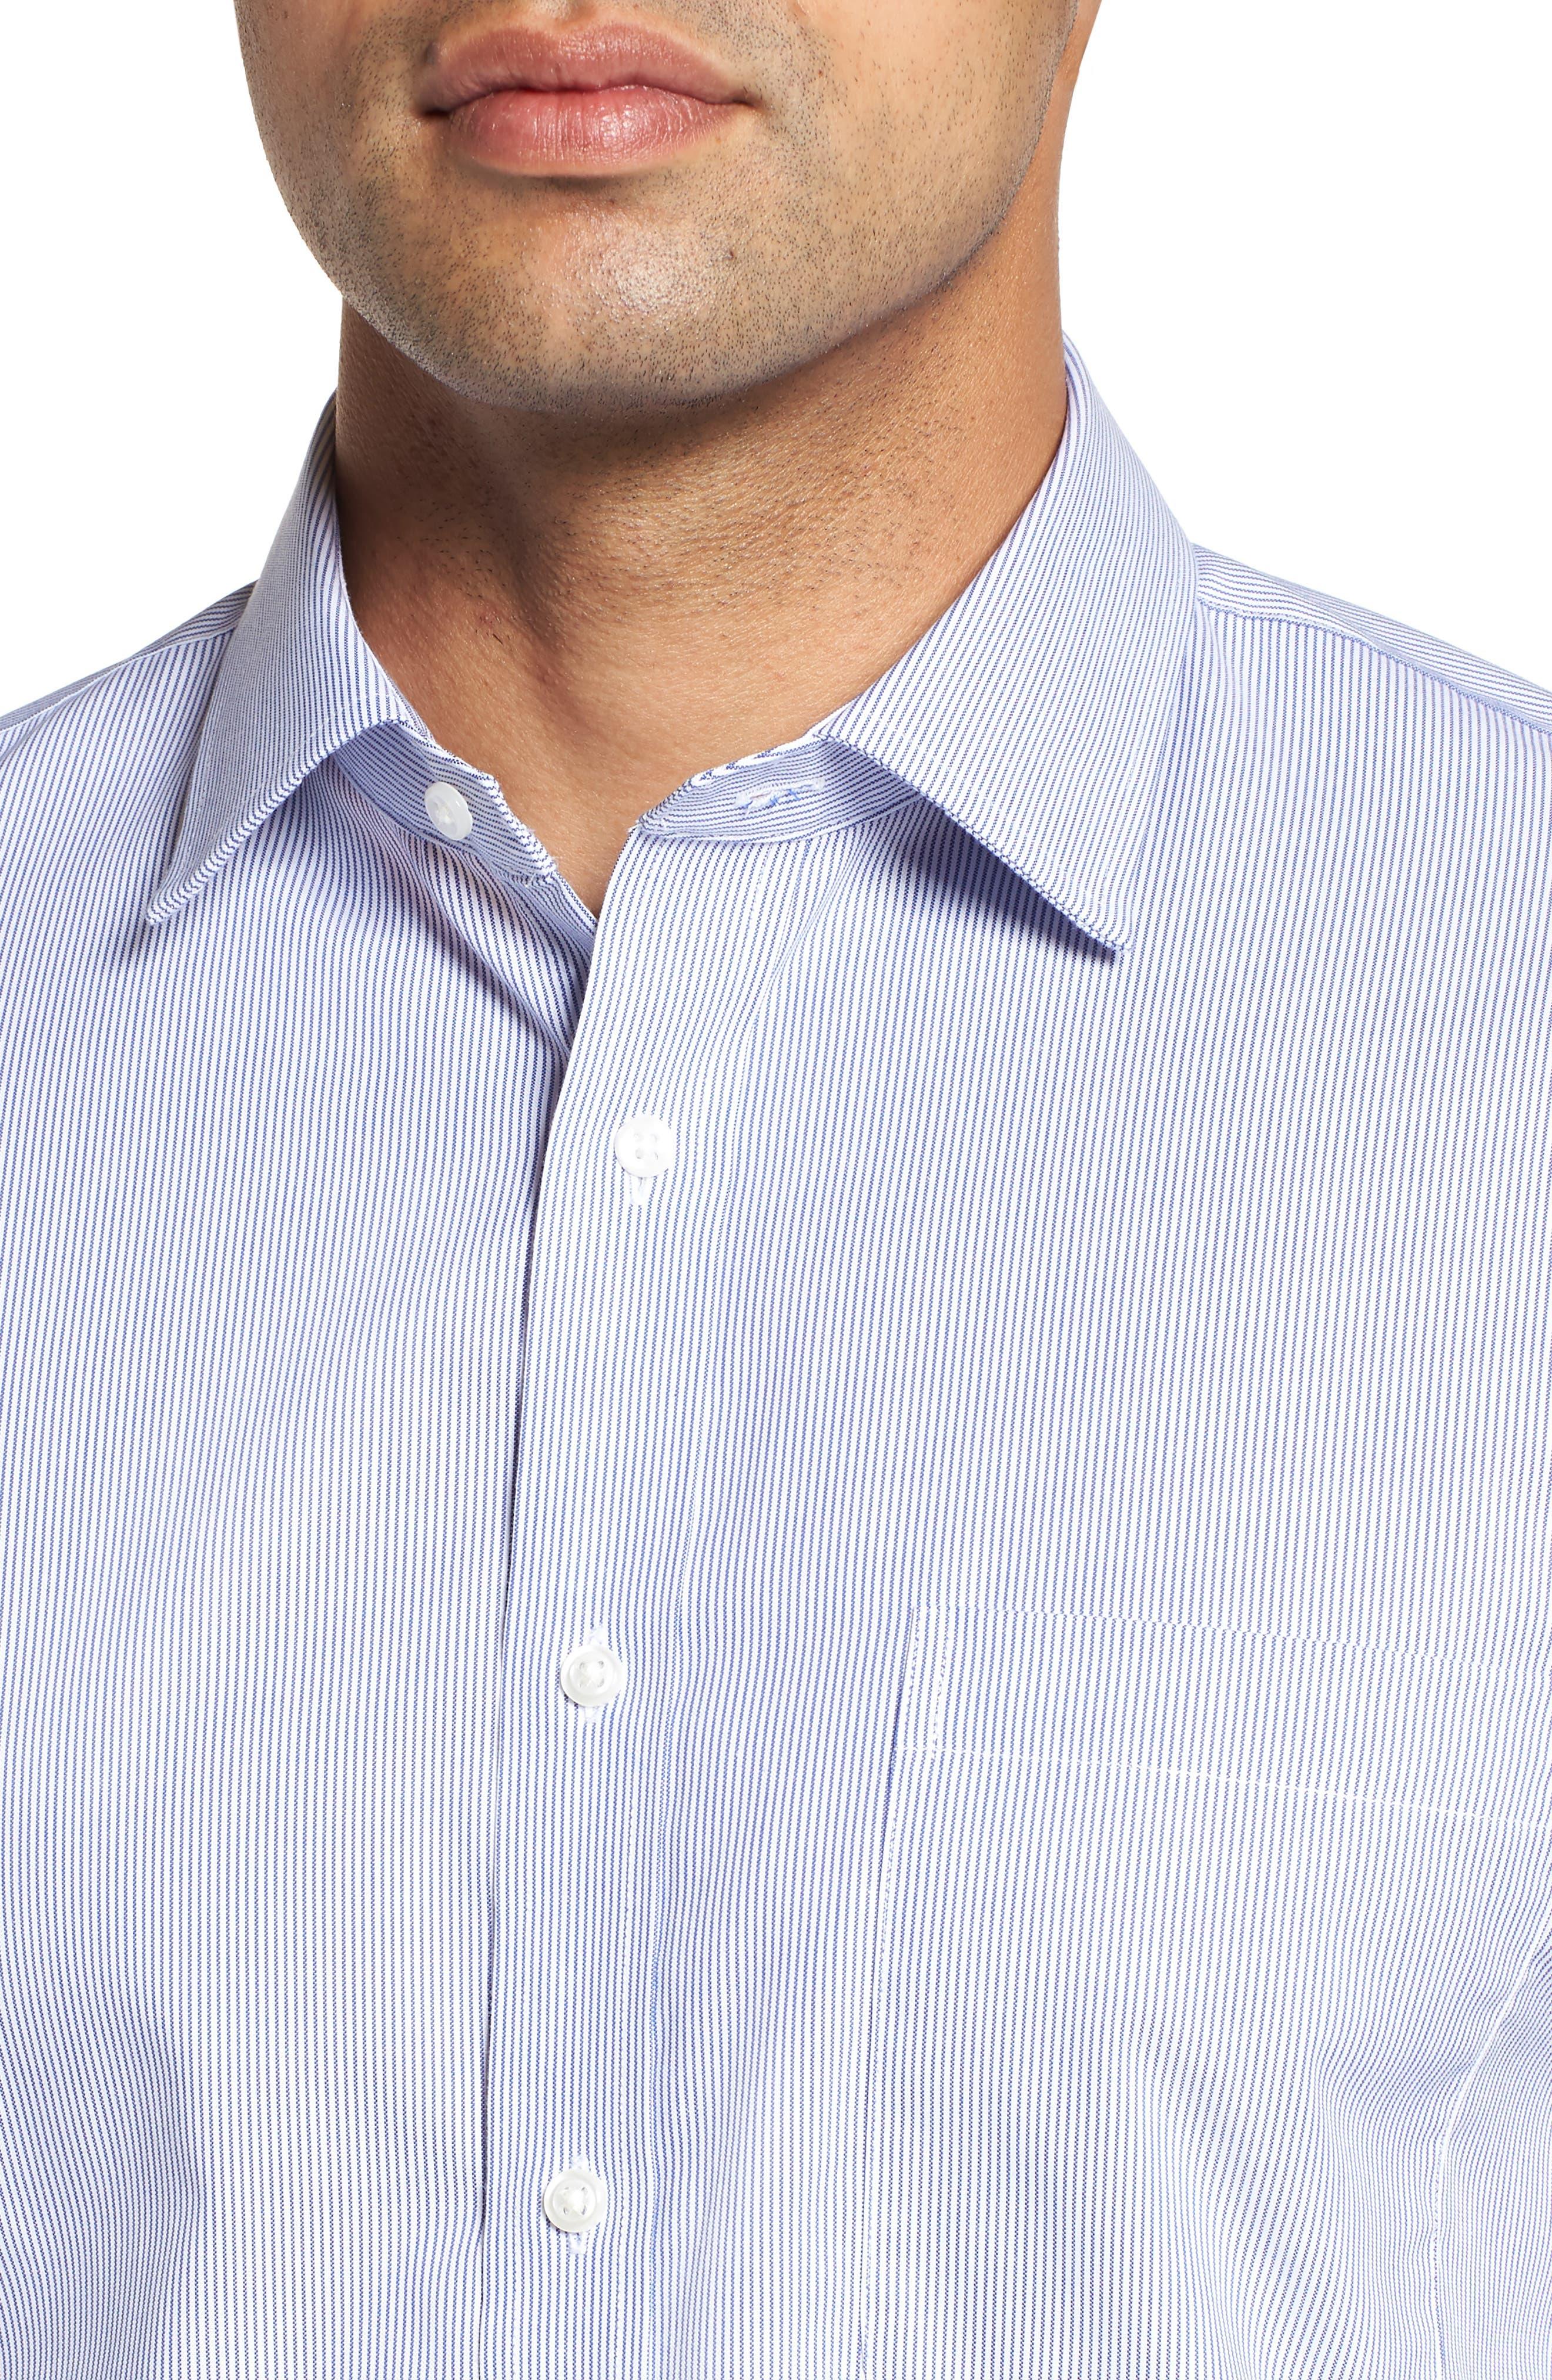 Trim Fit Non-Iron Stripe Dress Shirt,                             Alternate thumbnail 2, color,                             NAVY PATRIOT